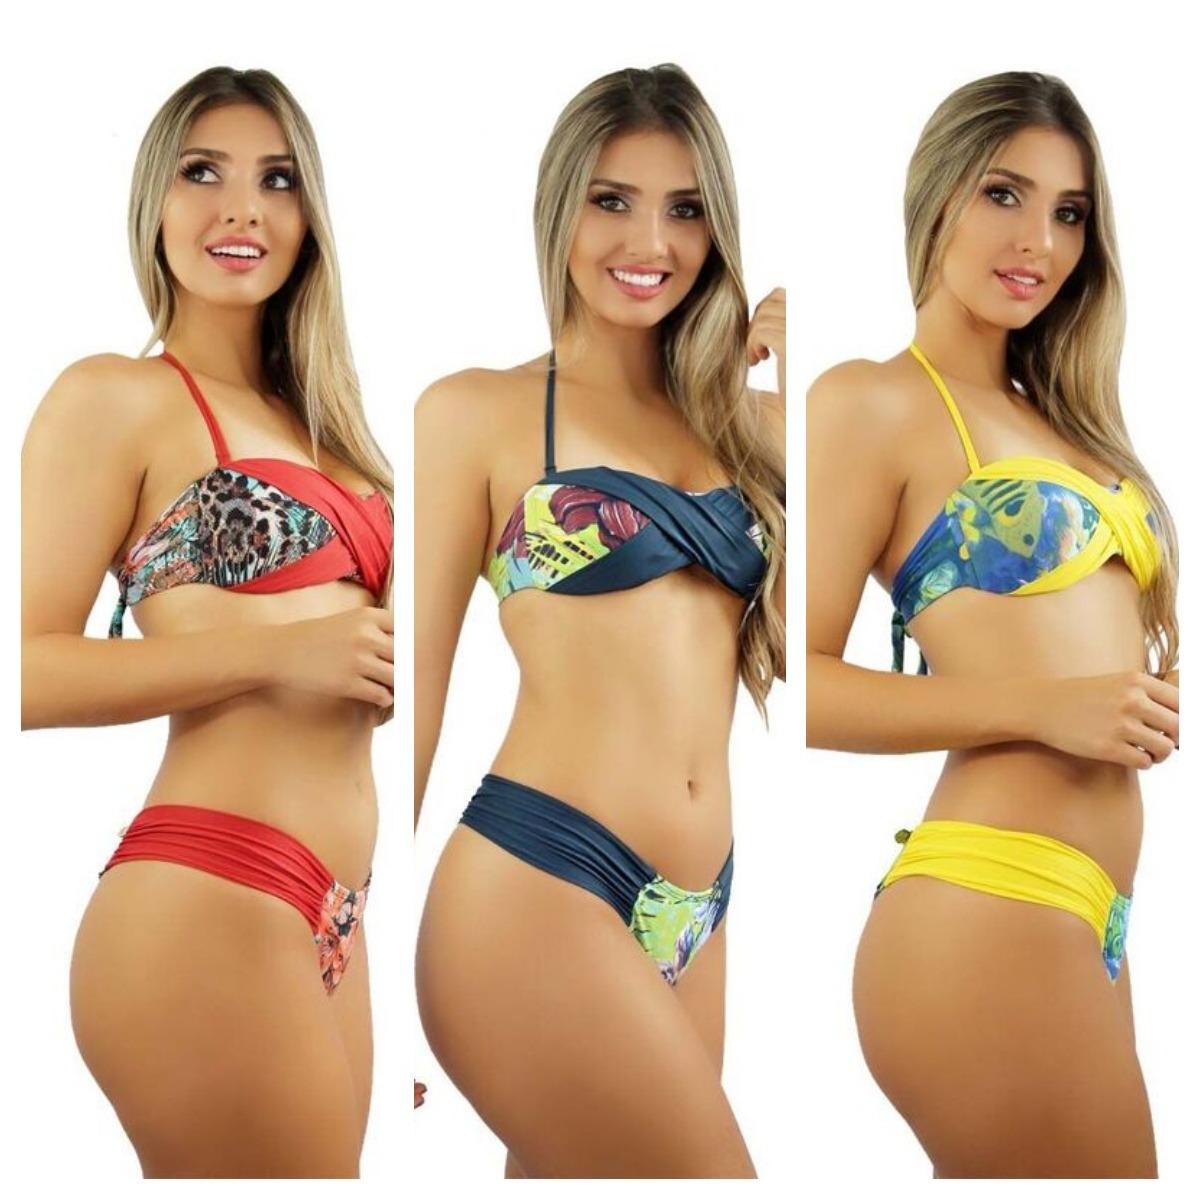 10b939ce68cf Biquini Panicat Alça Removível Moda Praia Verão 2018/2019 L2 - R$ 60 ...